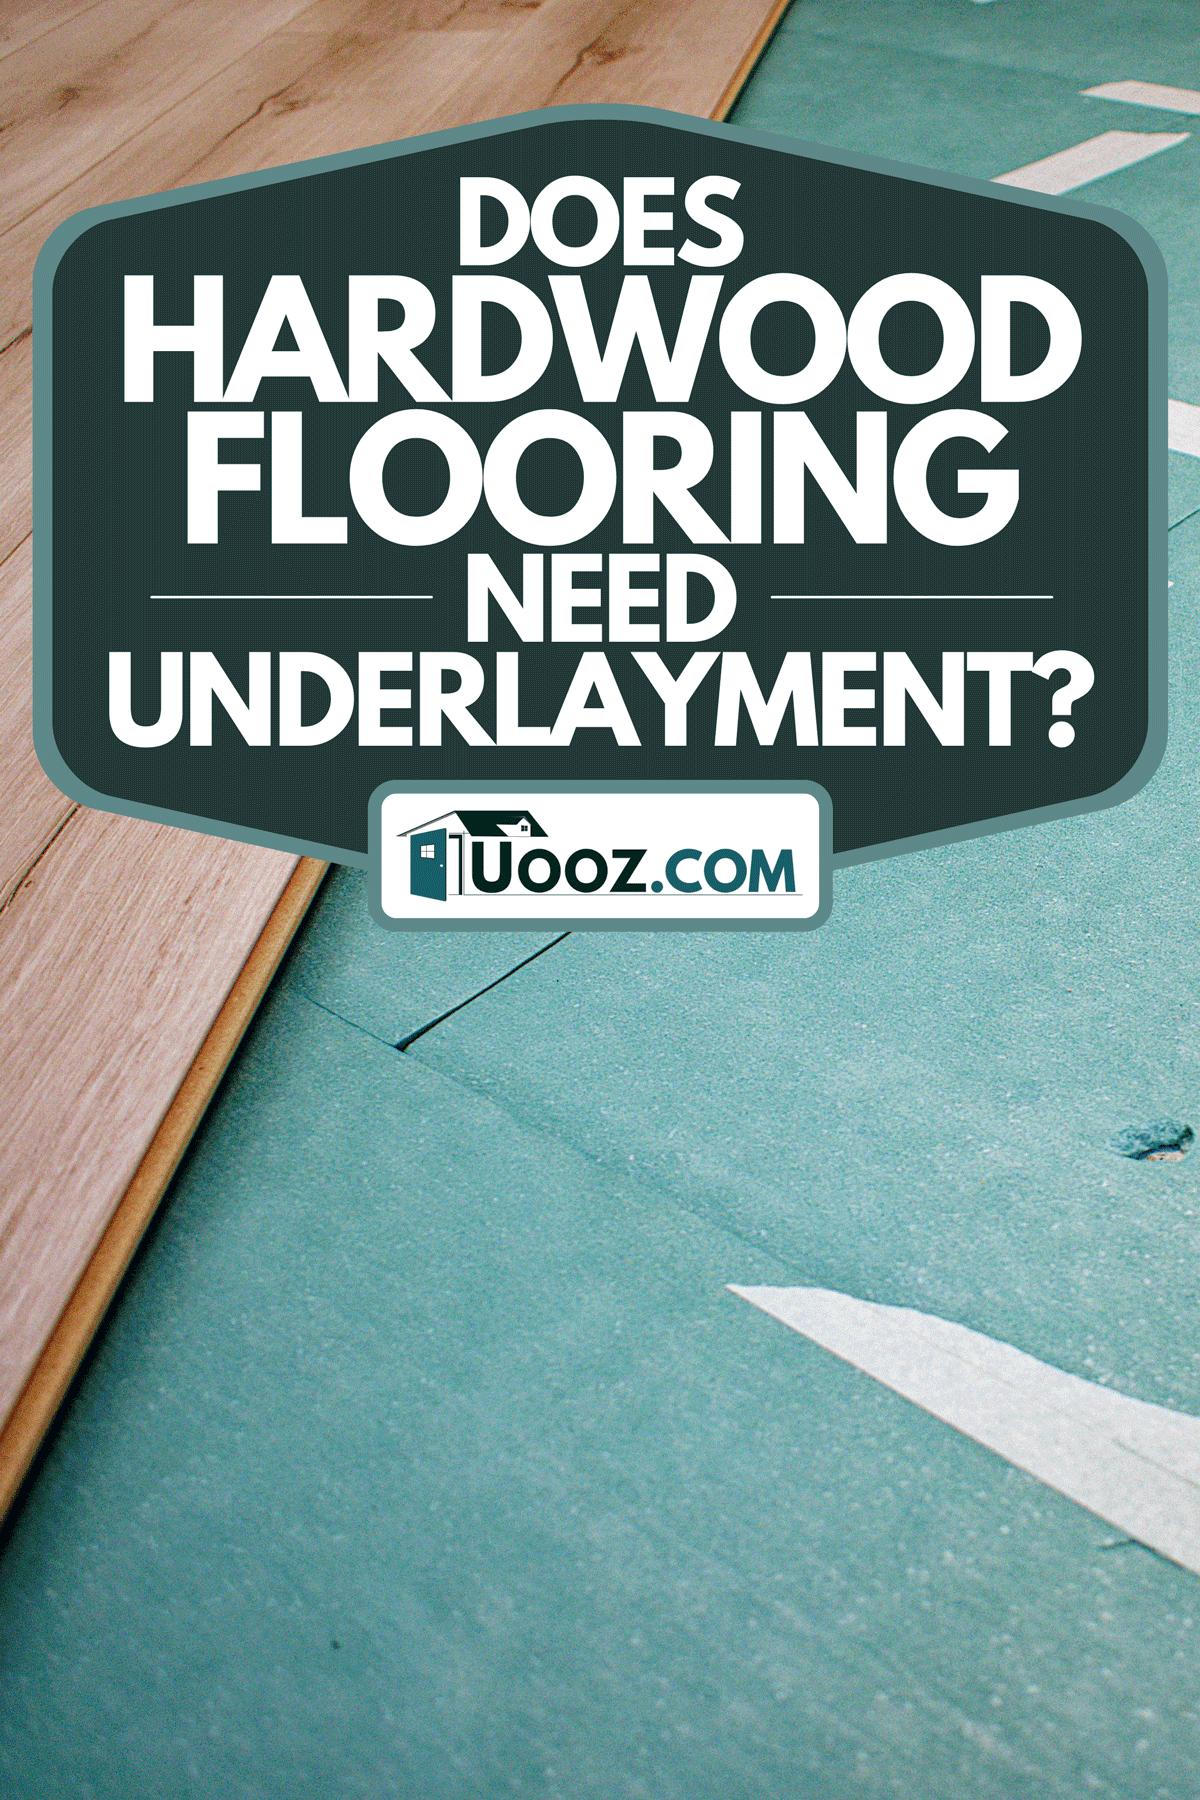 An underlayment for hardwood flooring, Does Hardwood Flooring Need Underlayment?